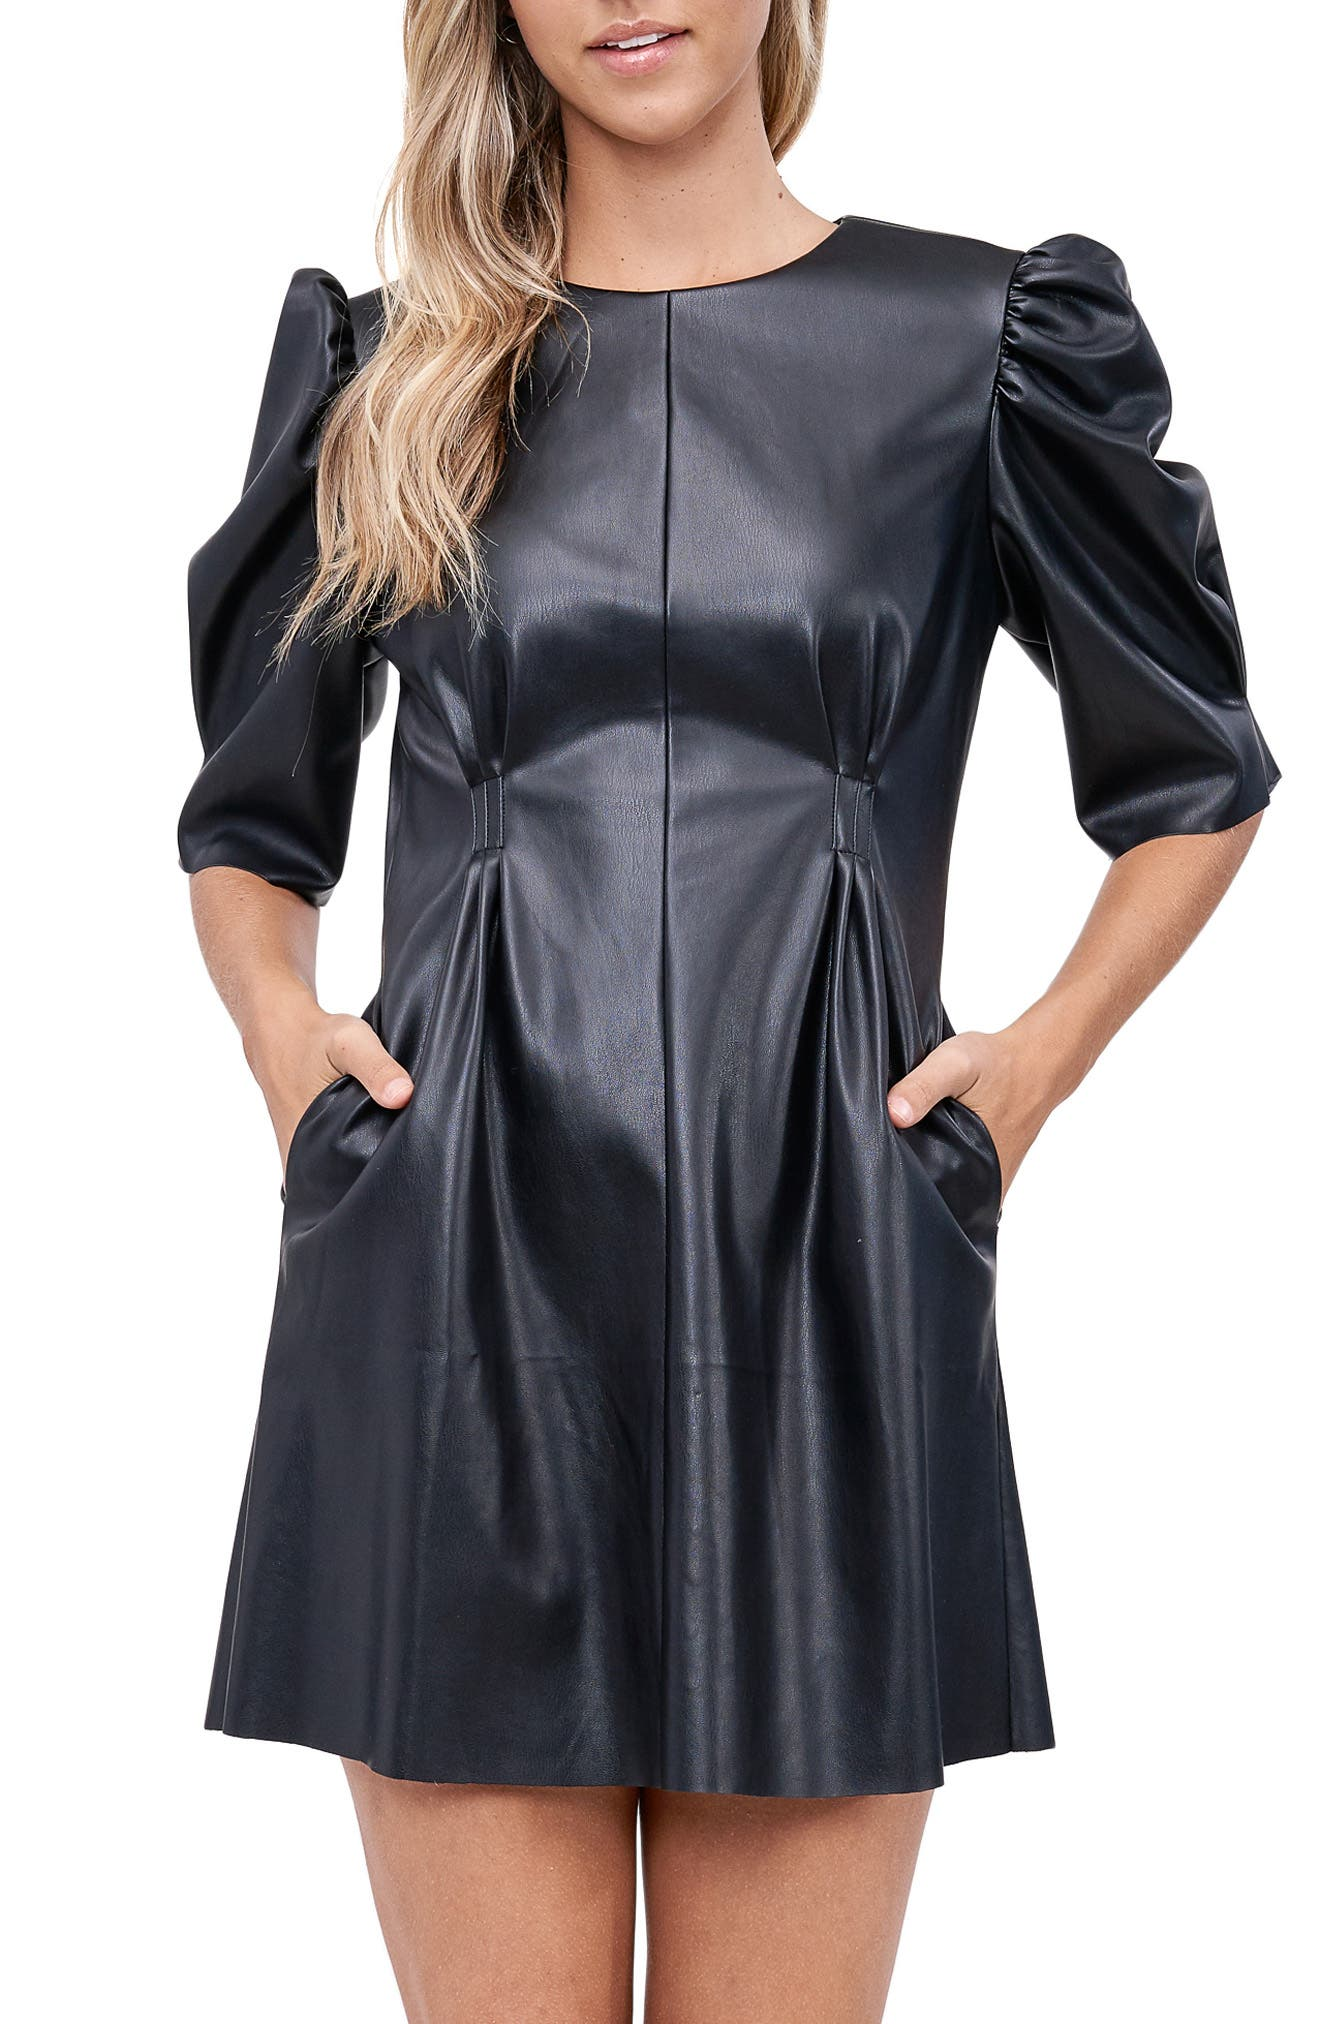 Puff Sleeve Faux Leather Minidress